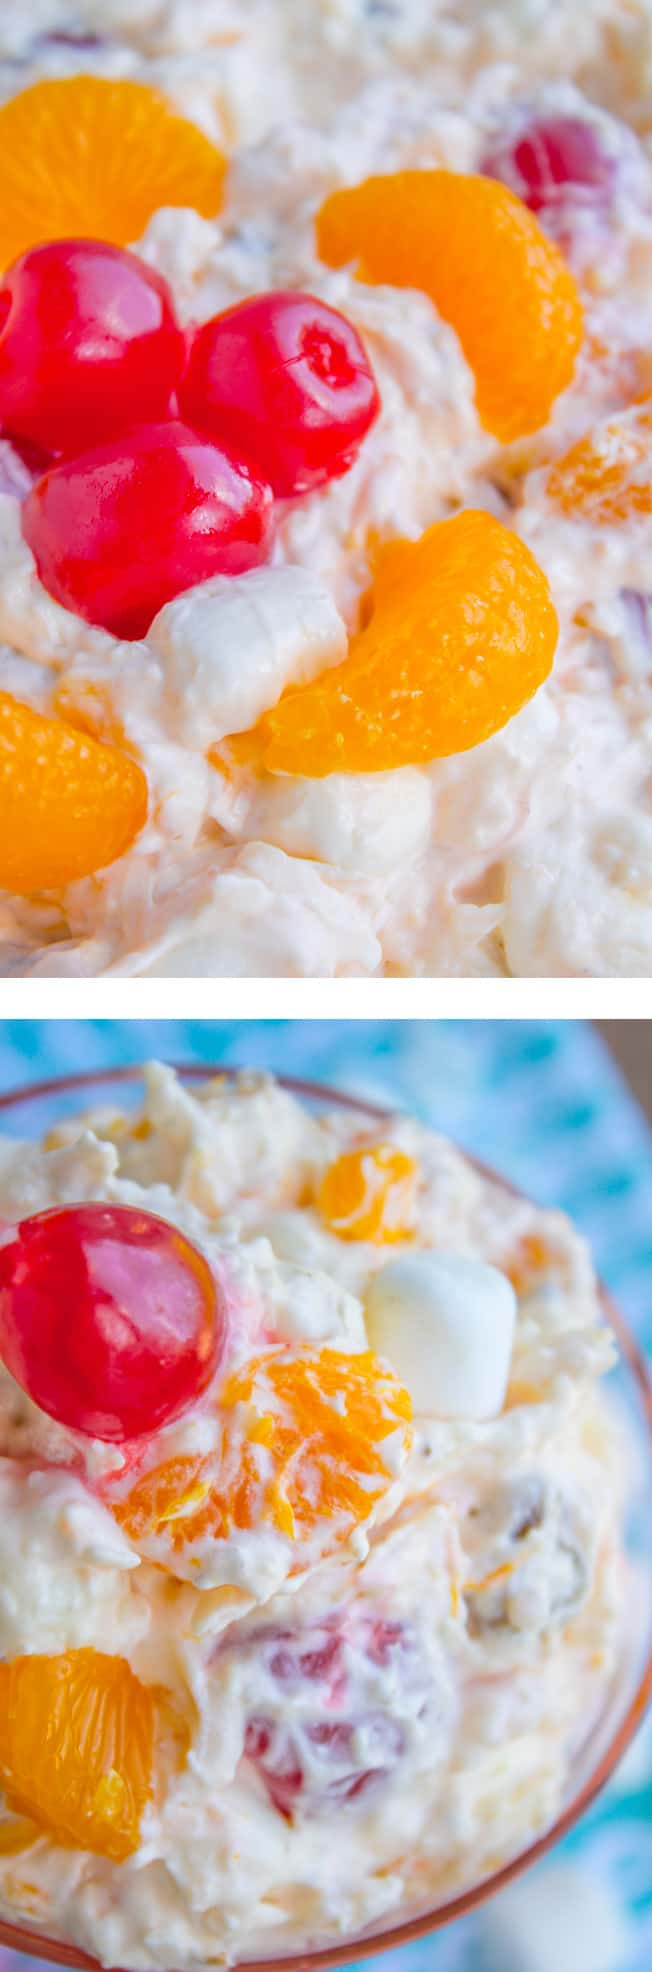 Mandarin Orange Ambrosia Salad - The Food Charlatan